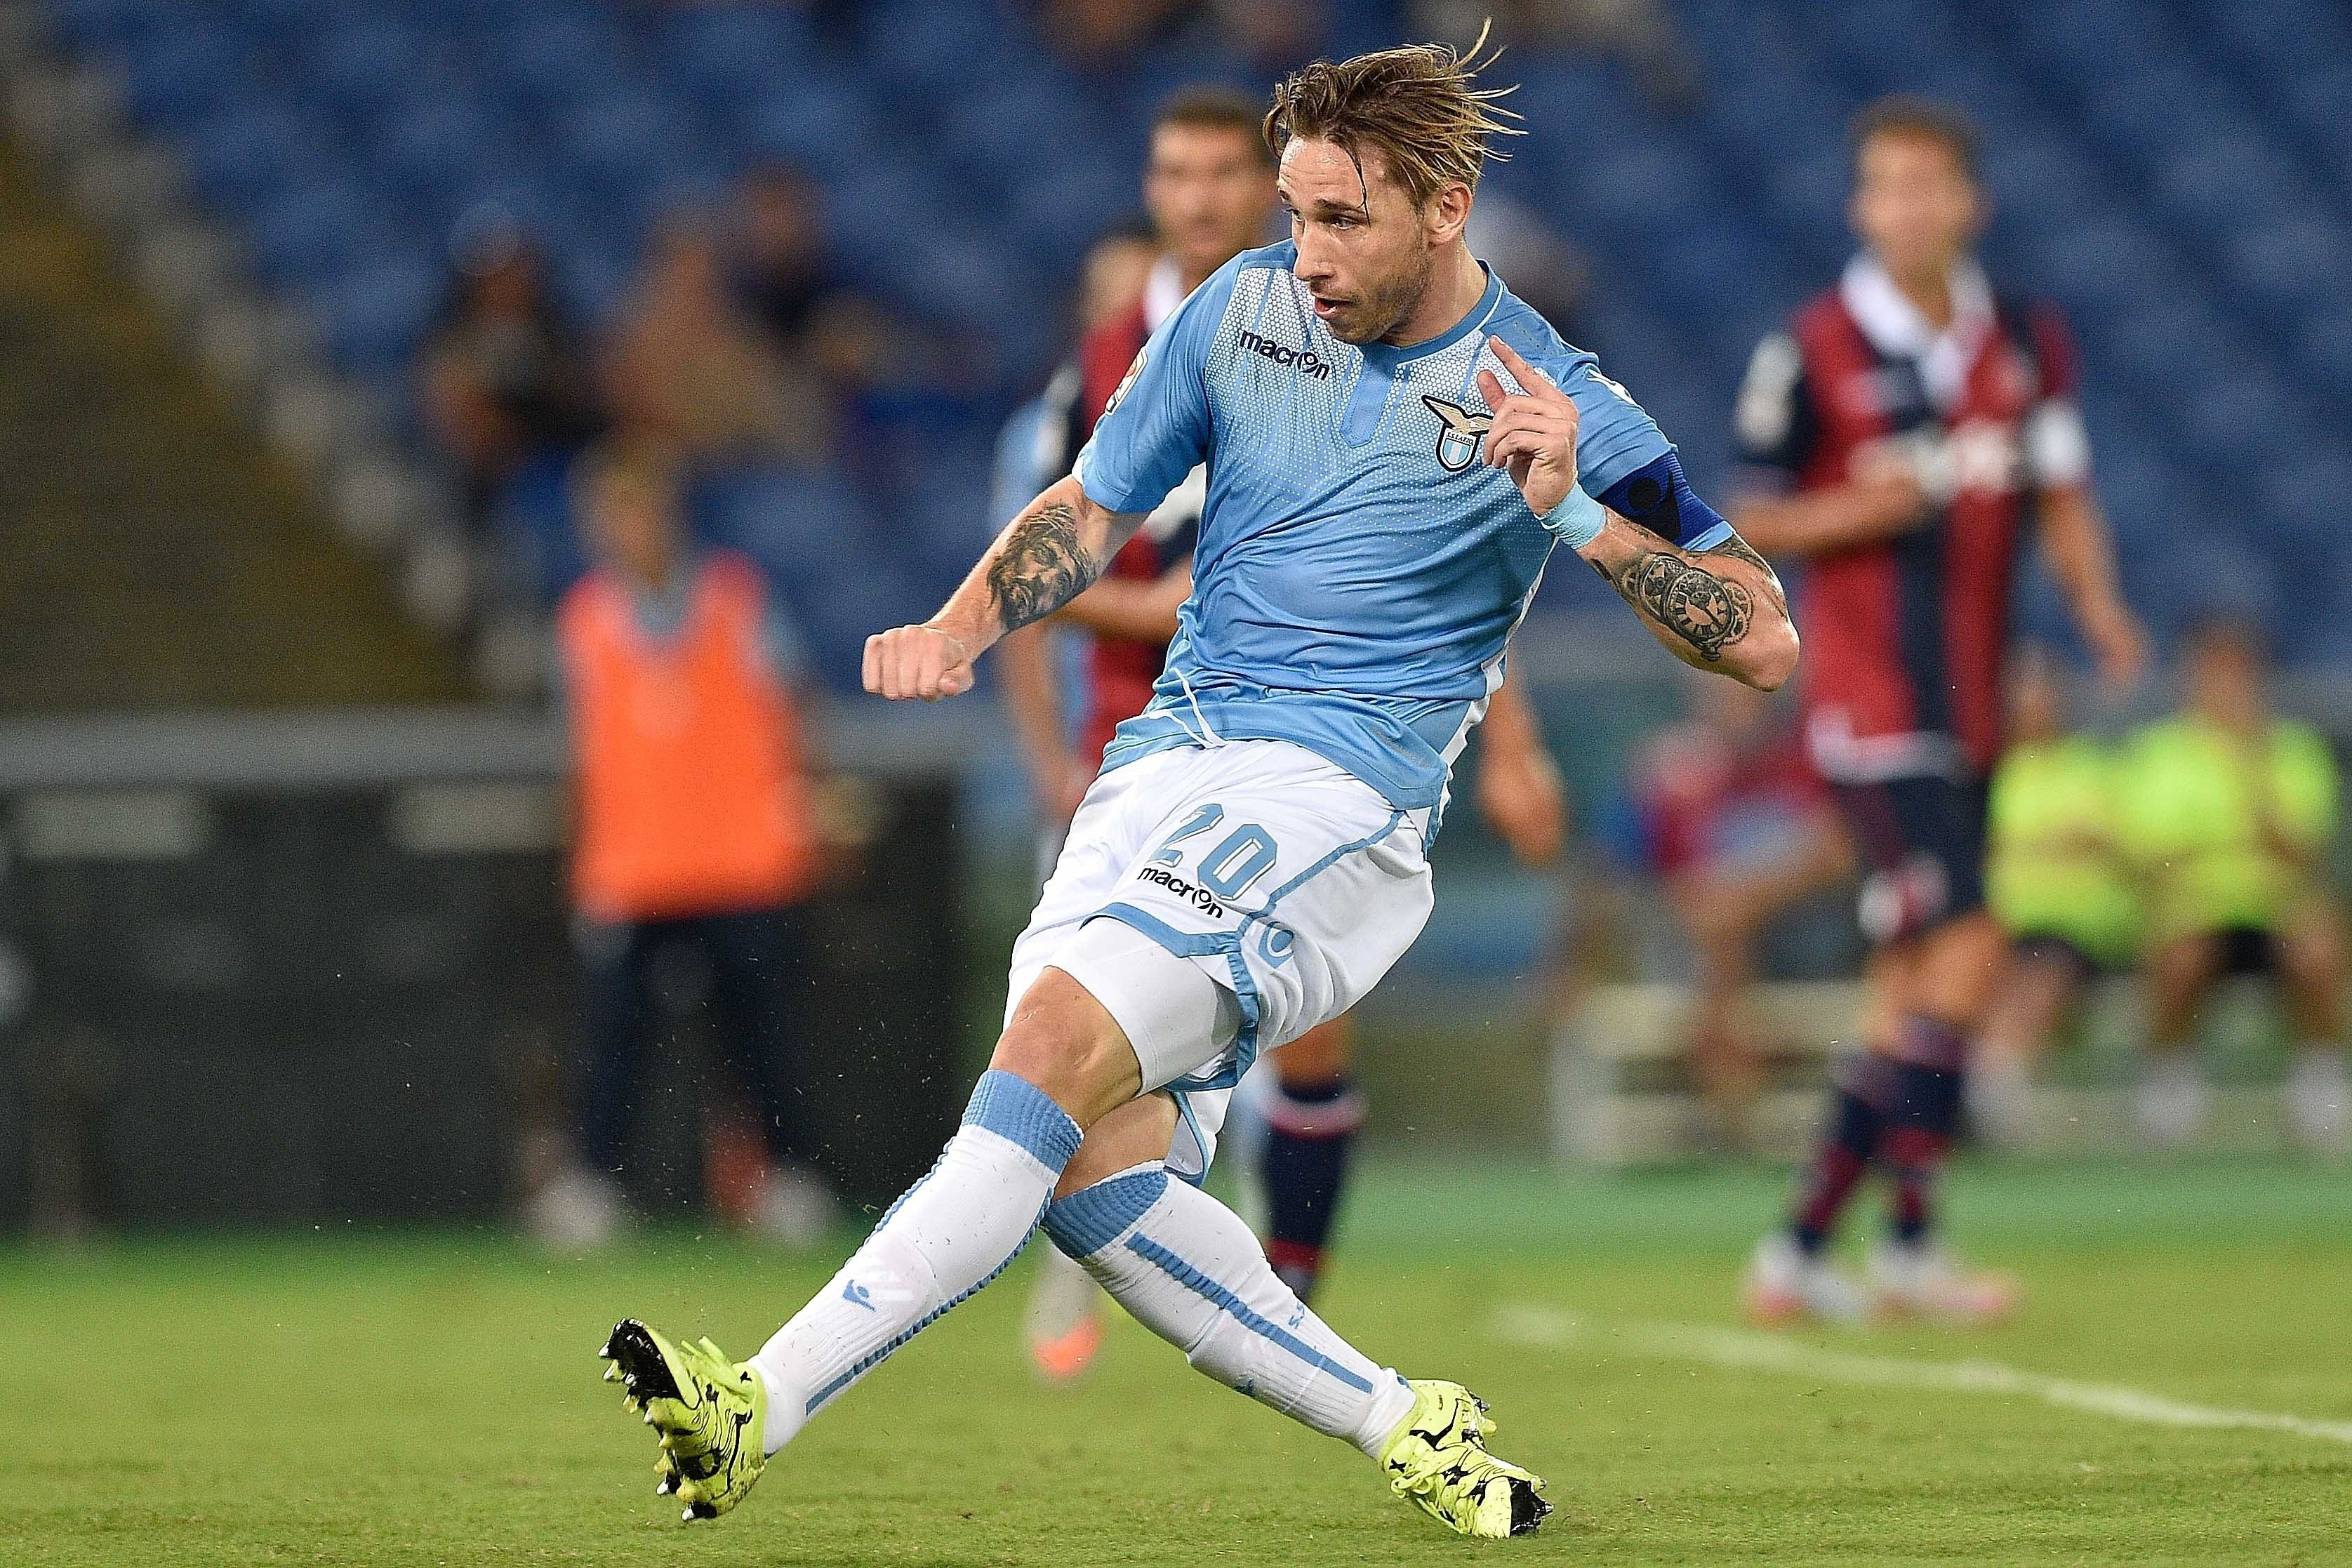 Jurgen Klopp factor sees Liverpool lead transfer race for Lazio's Lucas Biglia – report